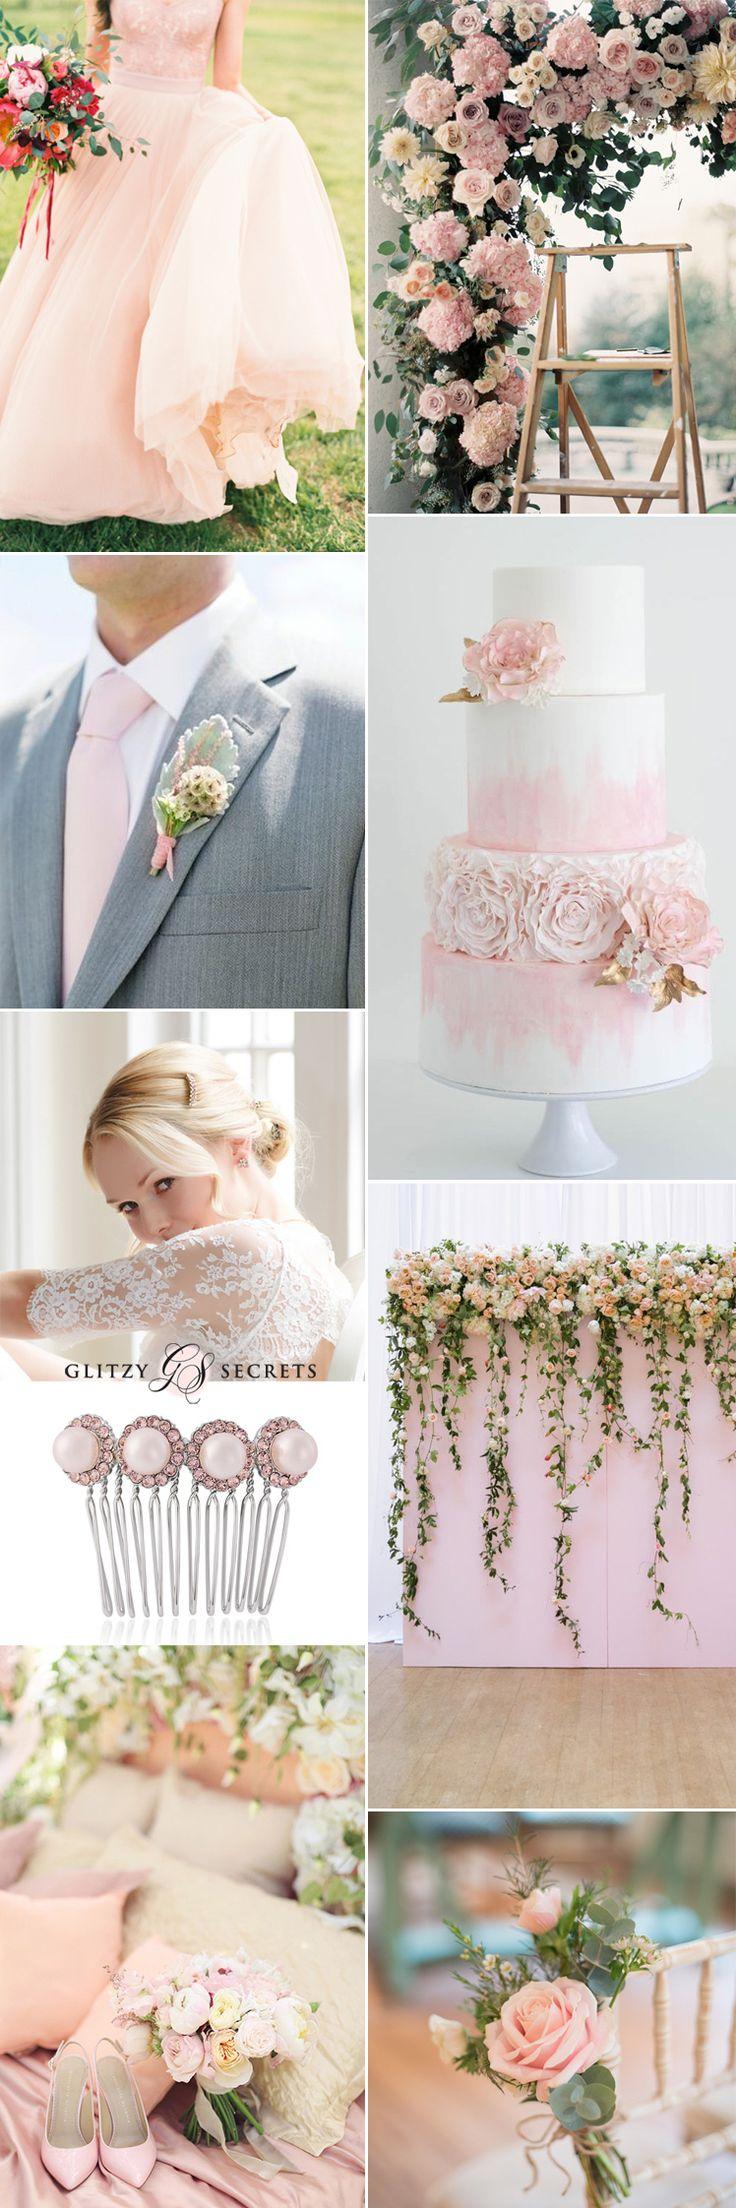 Pastel pink wedding ideas on GS Inspiration - Glitzy Secrets